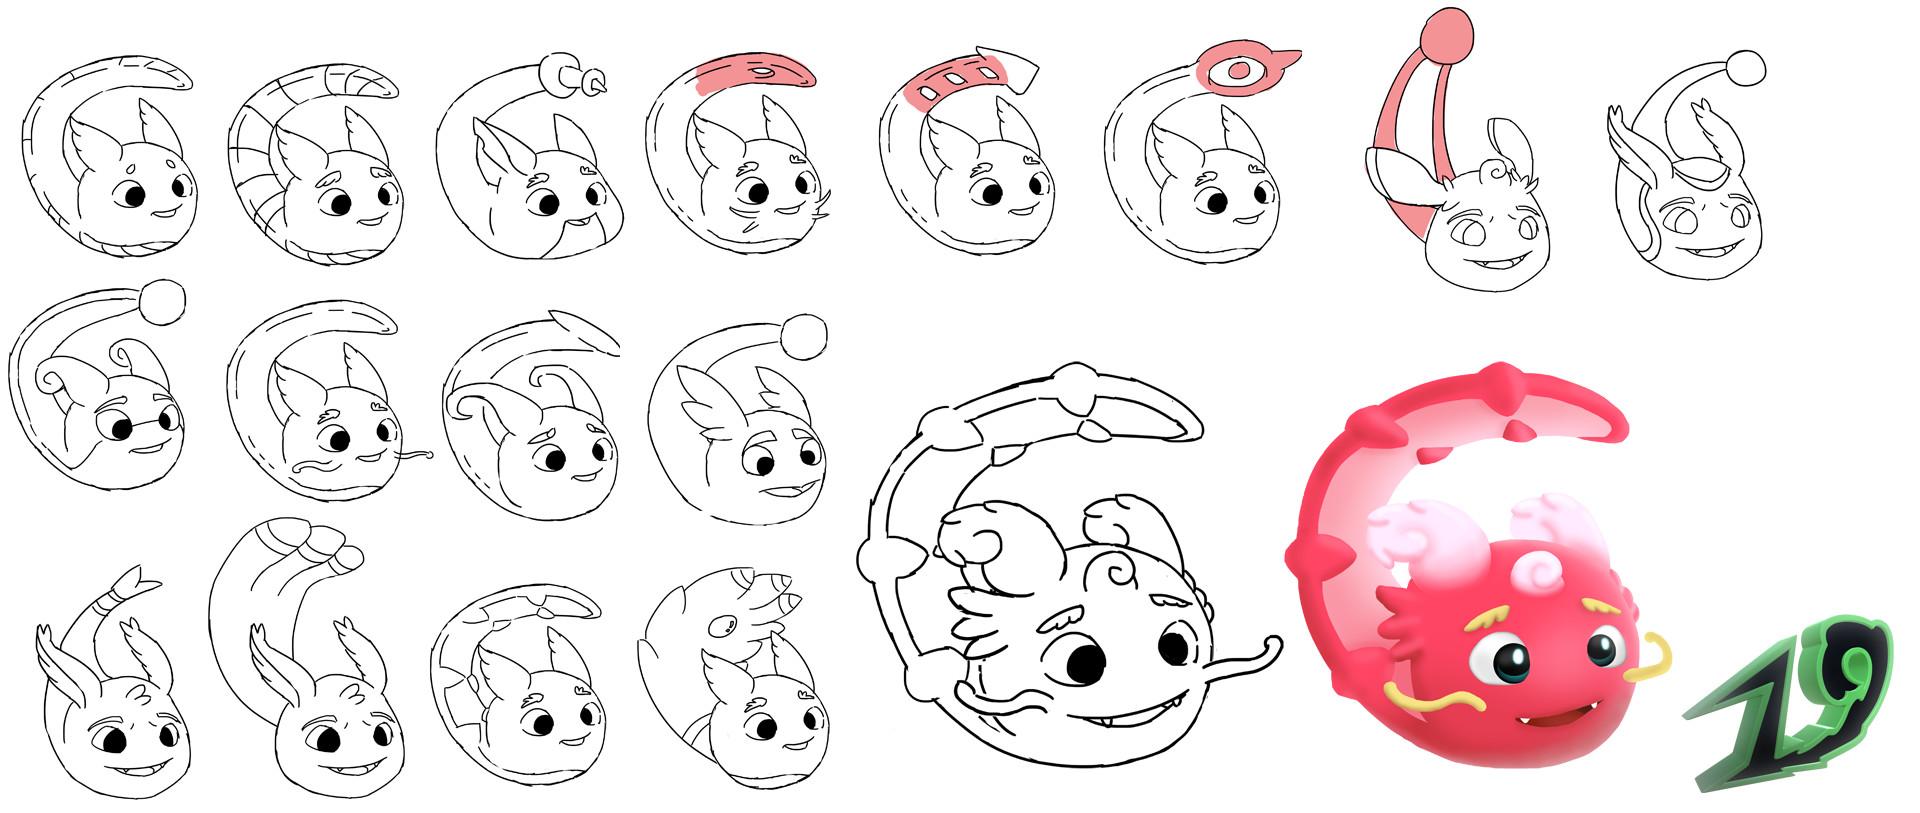 Matthew ramirez concept sketches george 001